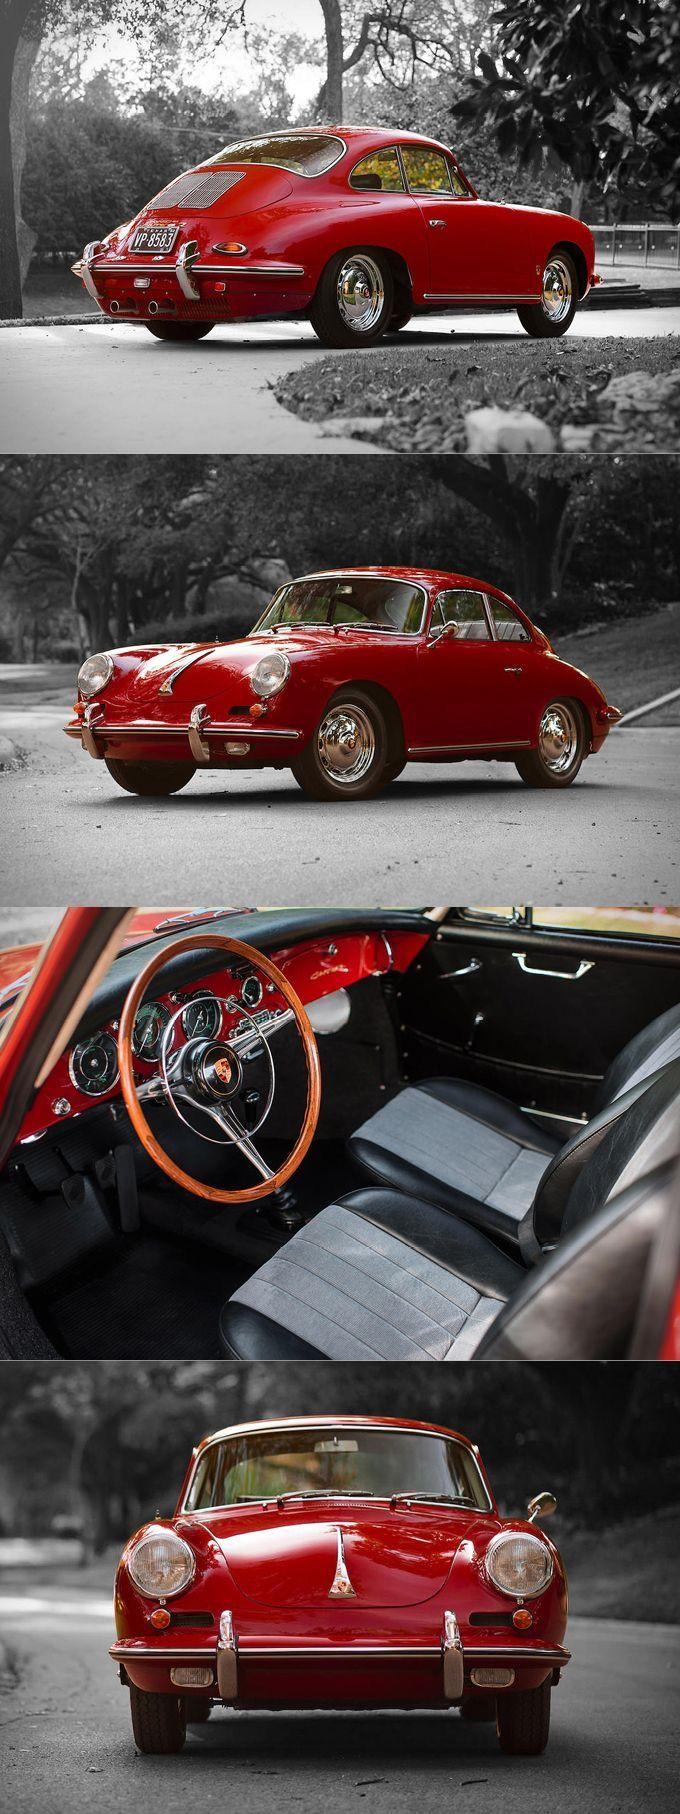 1962 Porsche 356 Carrera. ♥️  #porsche #canada #red #classiccars #vintagecars #sunday #cars #vintage #classic #classiccarsdaily #photography #carrera #beauty